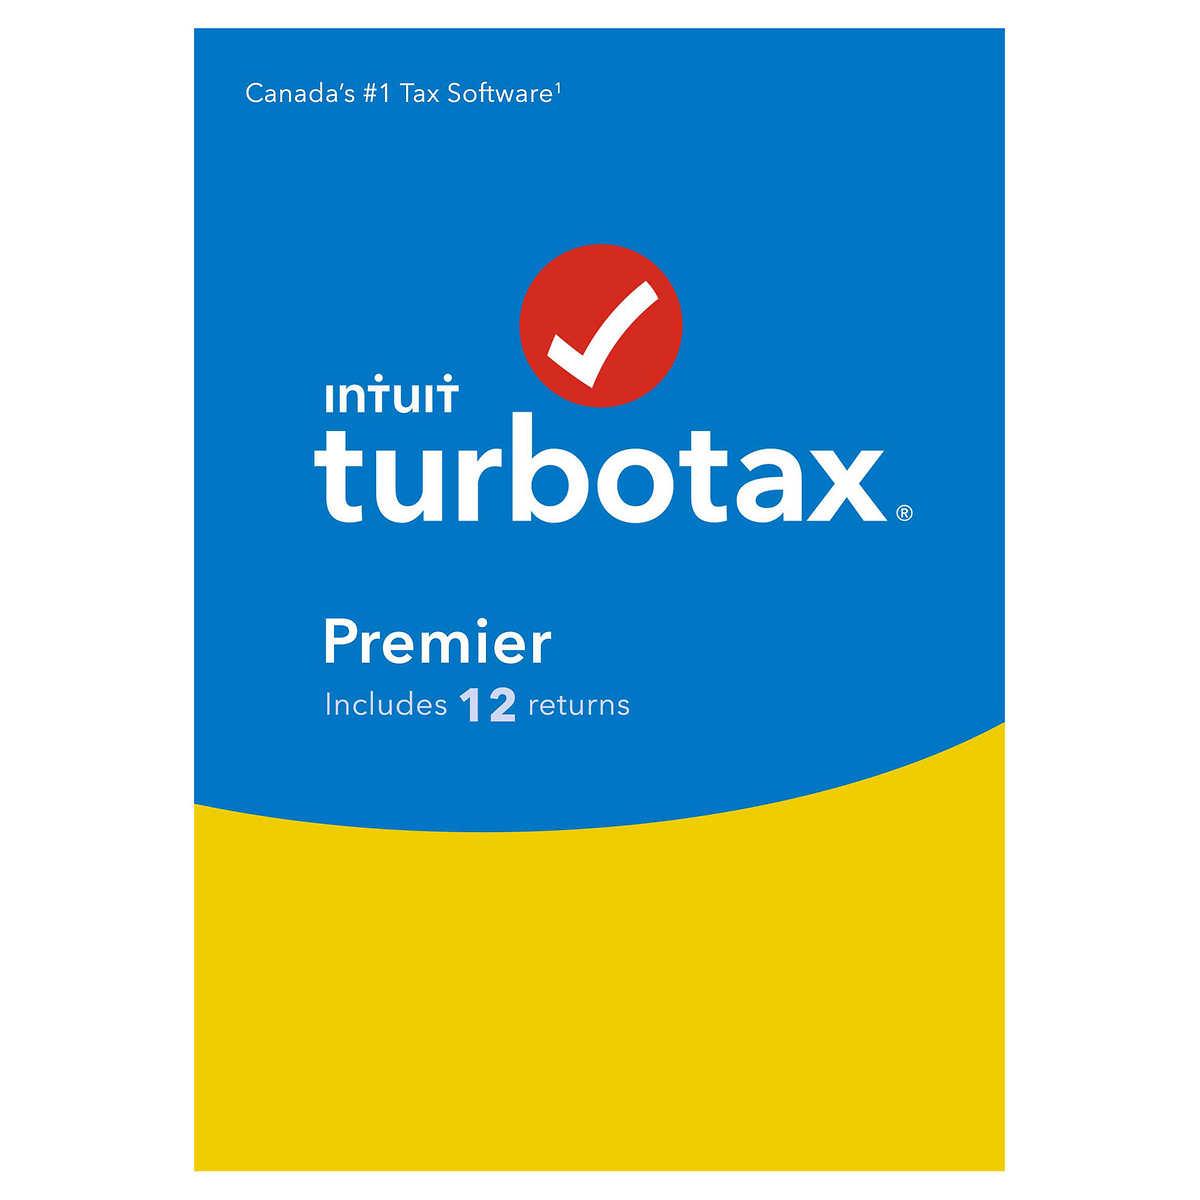 Intuit TurboTax Premier 2018, 12 Returns, English, Digital Download